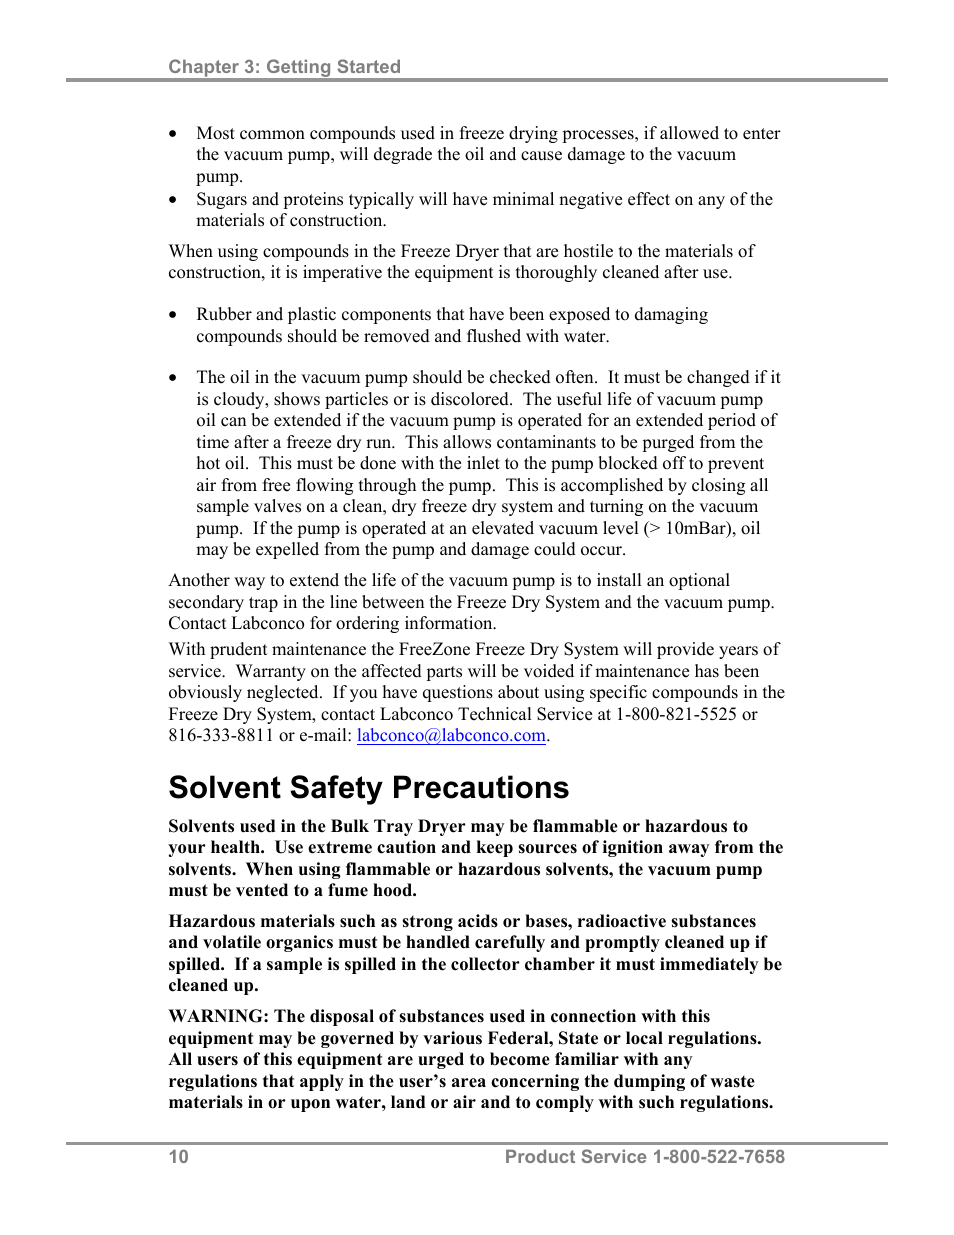 Solvent safety precautions | Labconco FreeZone Bulk Tray